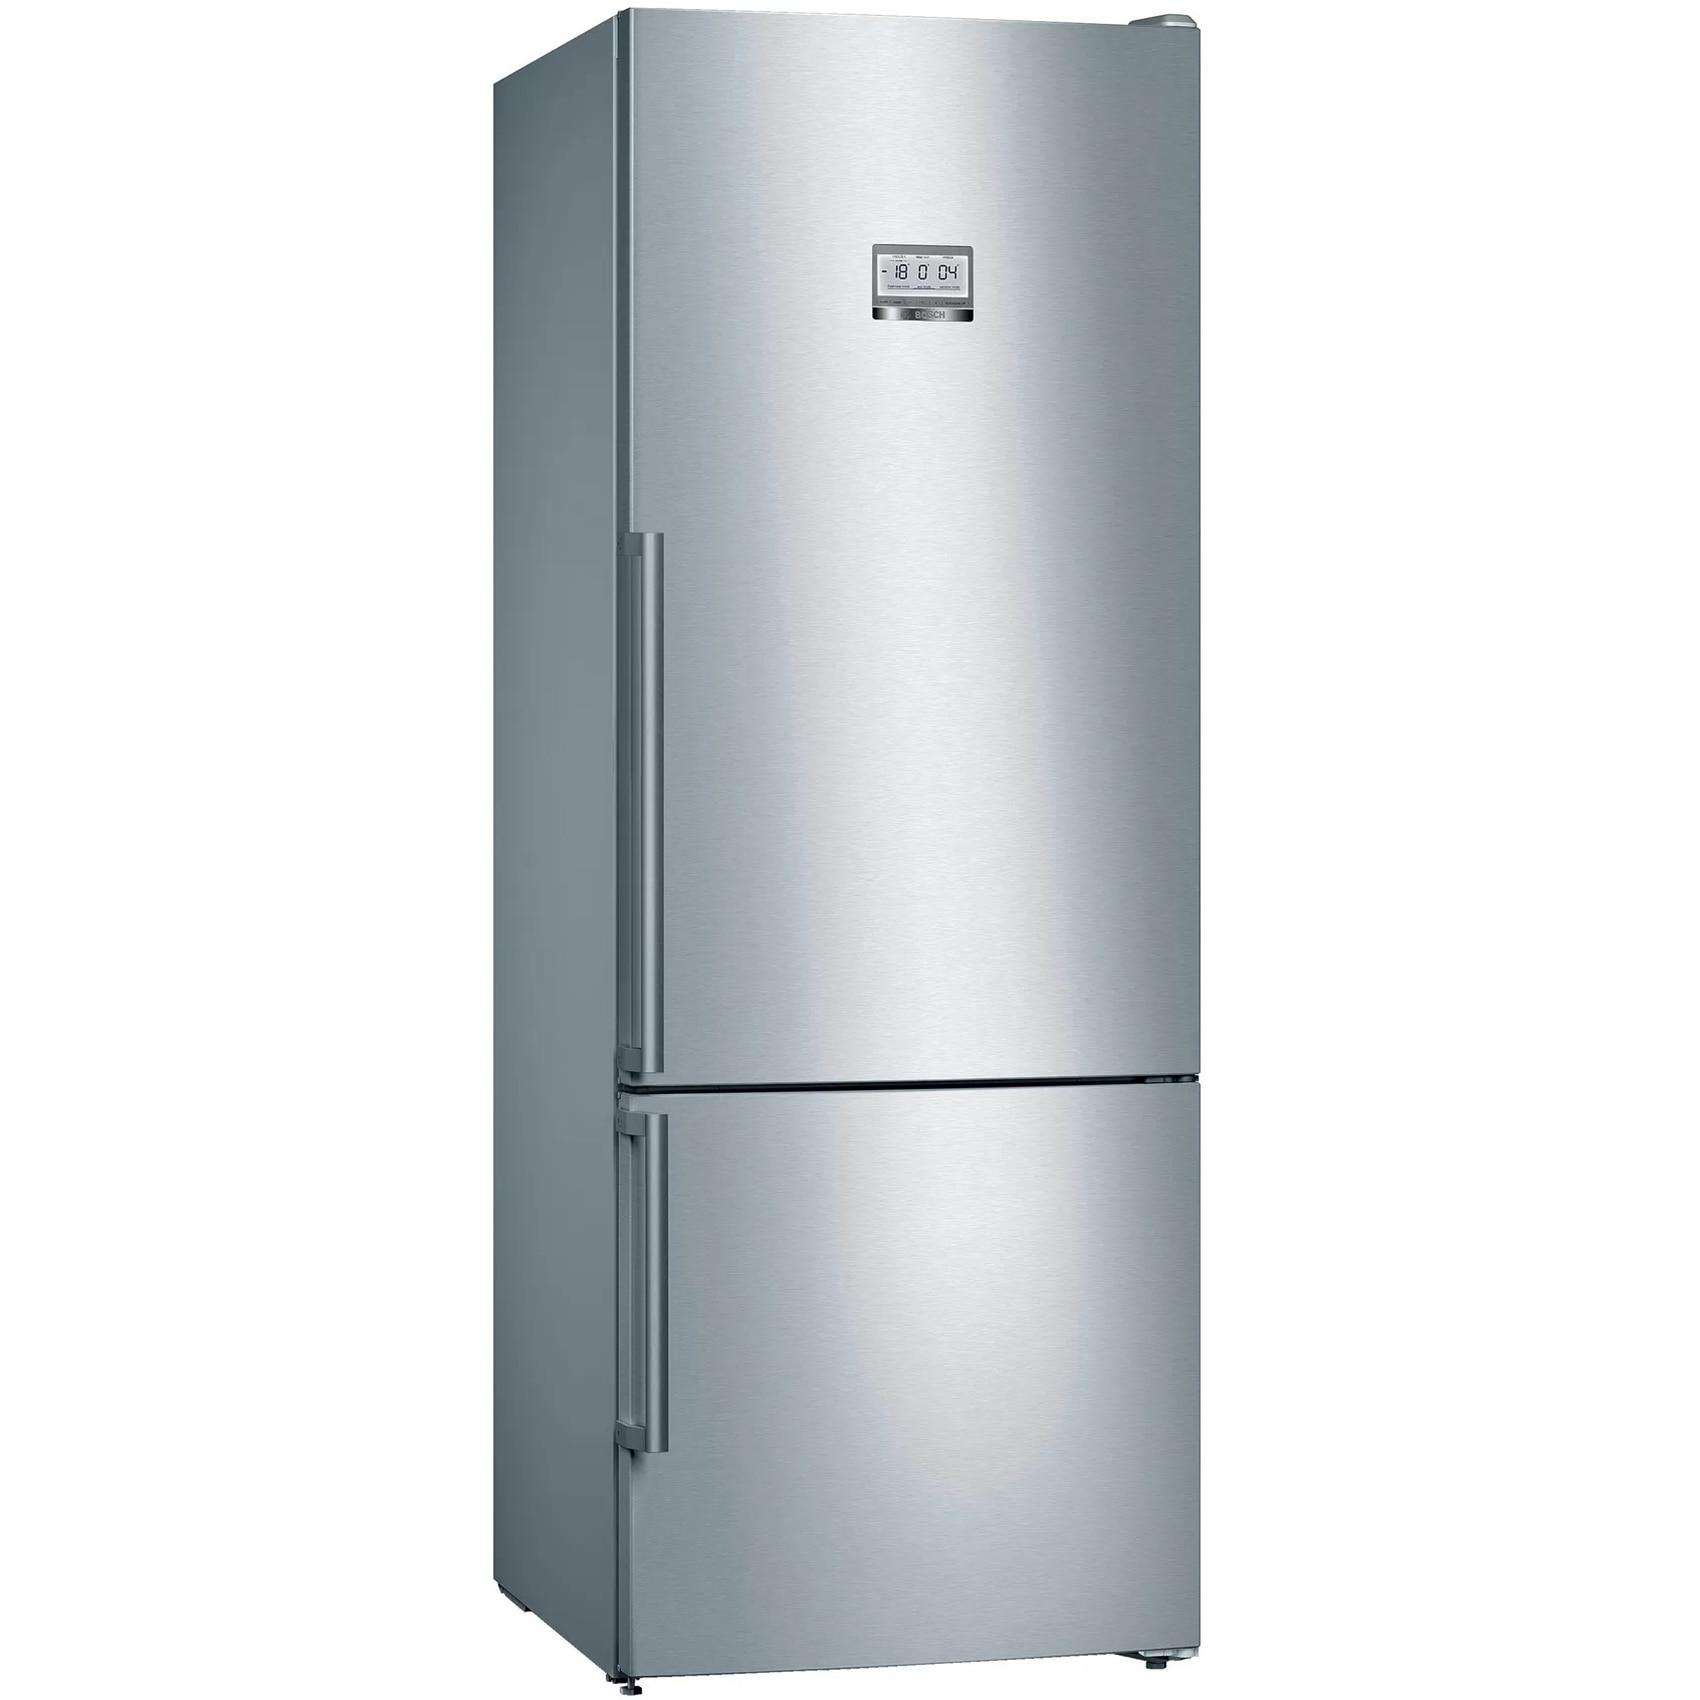 Fotografie Combina frigorifica Bosch KGF56PIDP, 483 l, Clasa D, NoFrost, VitaFresh, H 193 cm, Inox antiamprenta